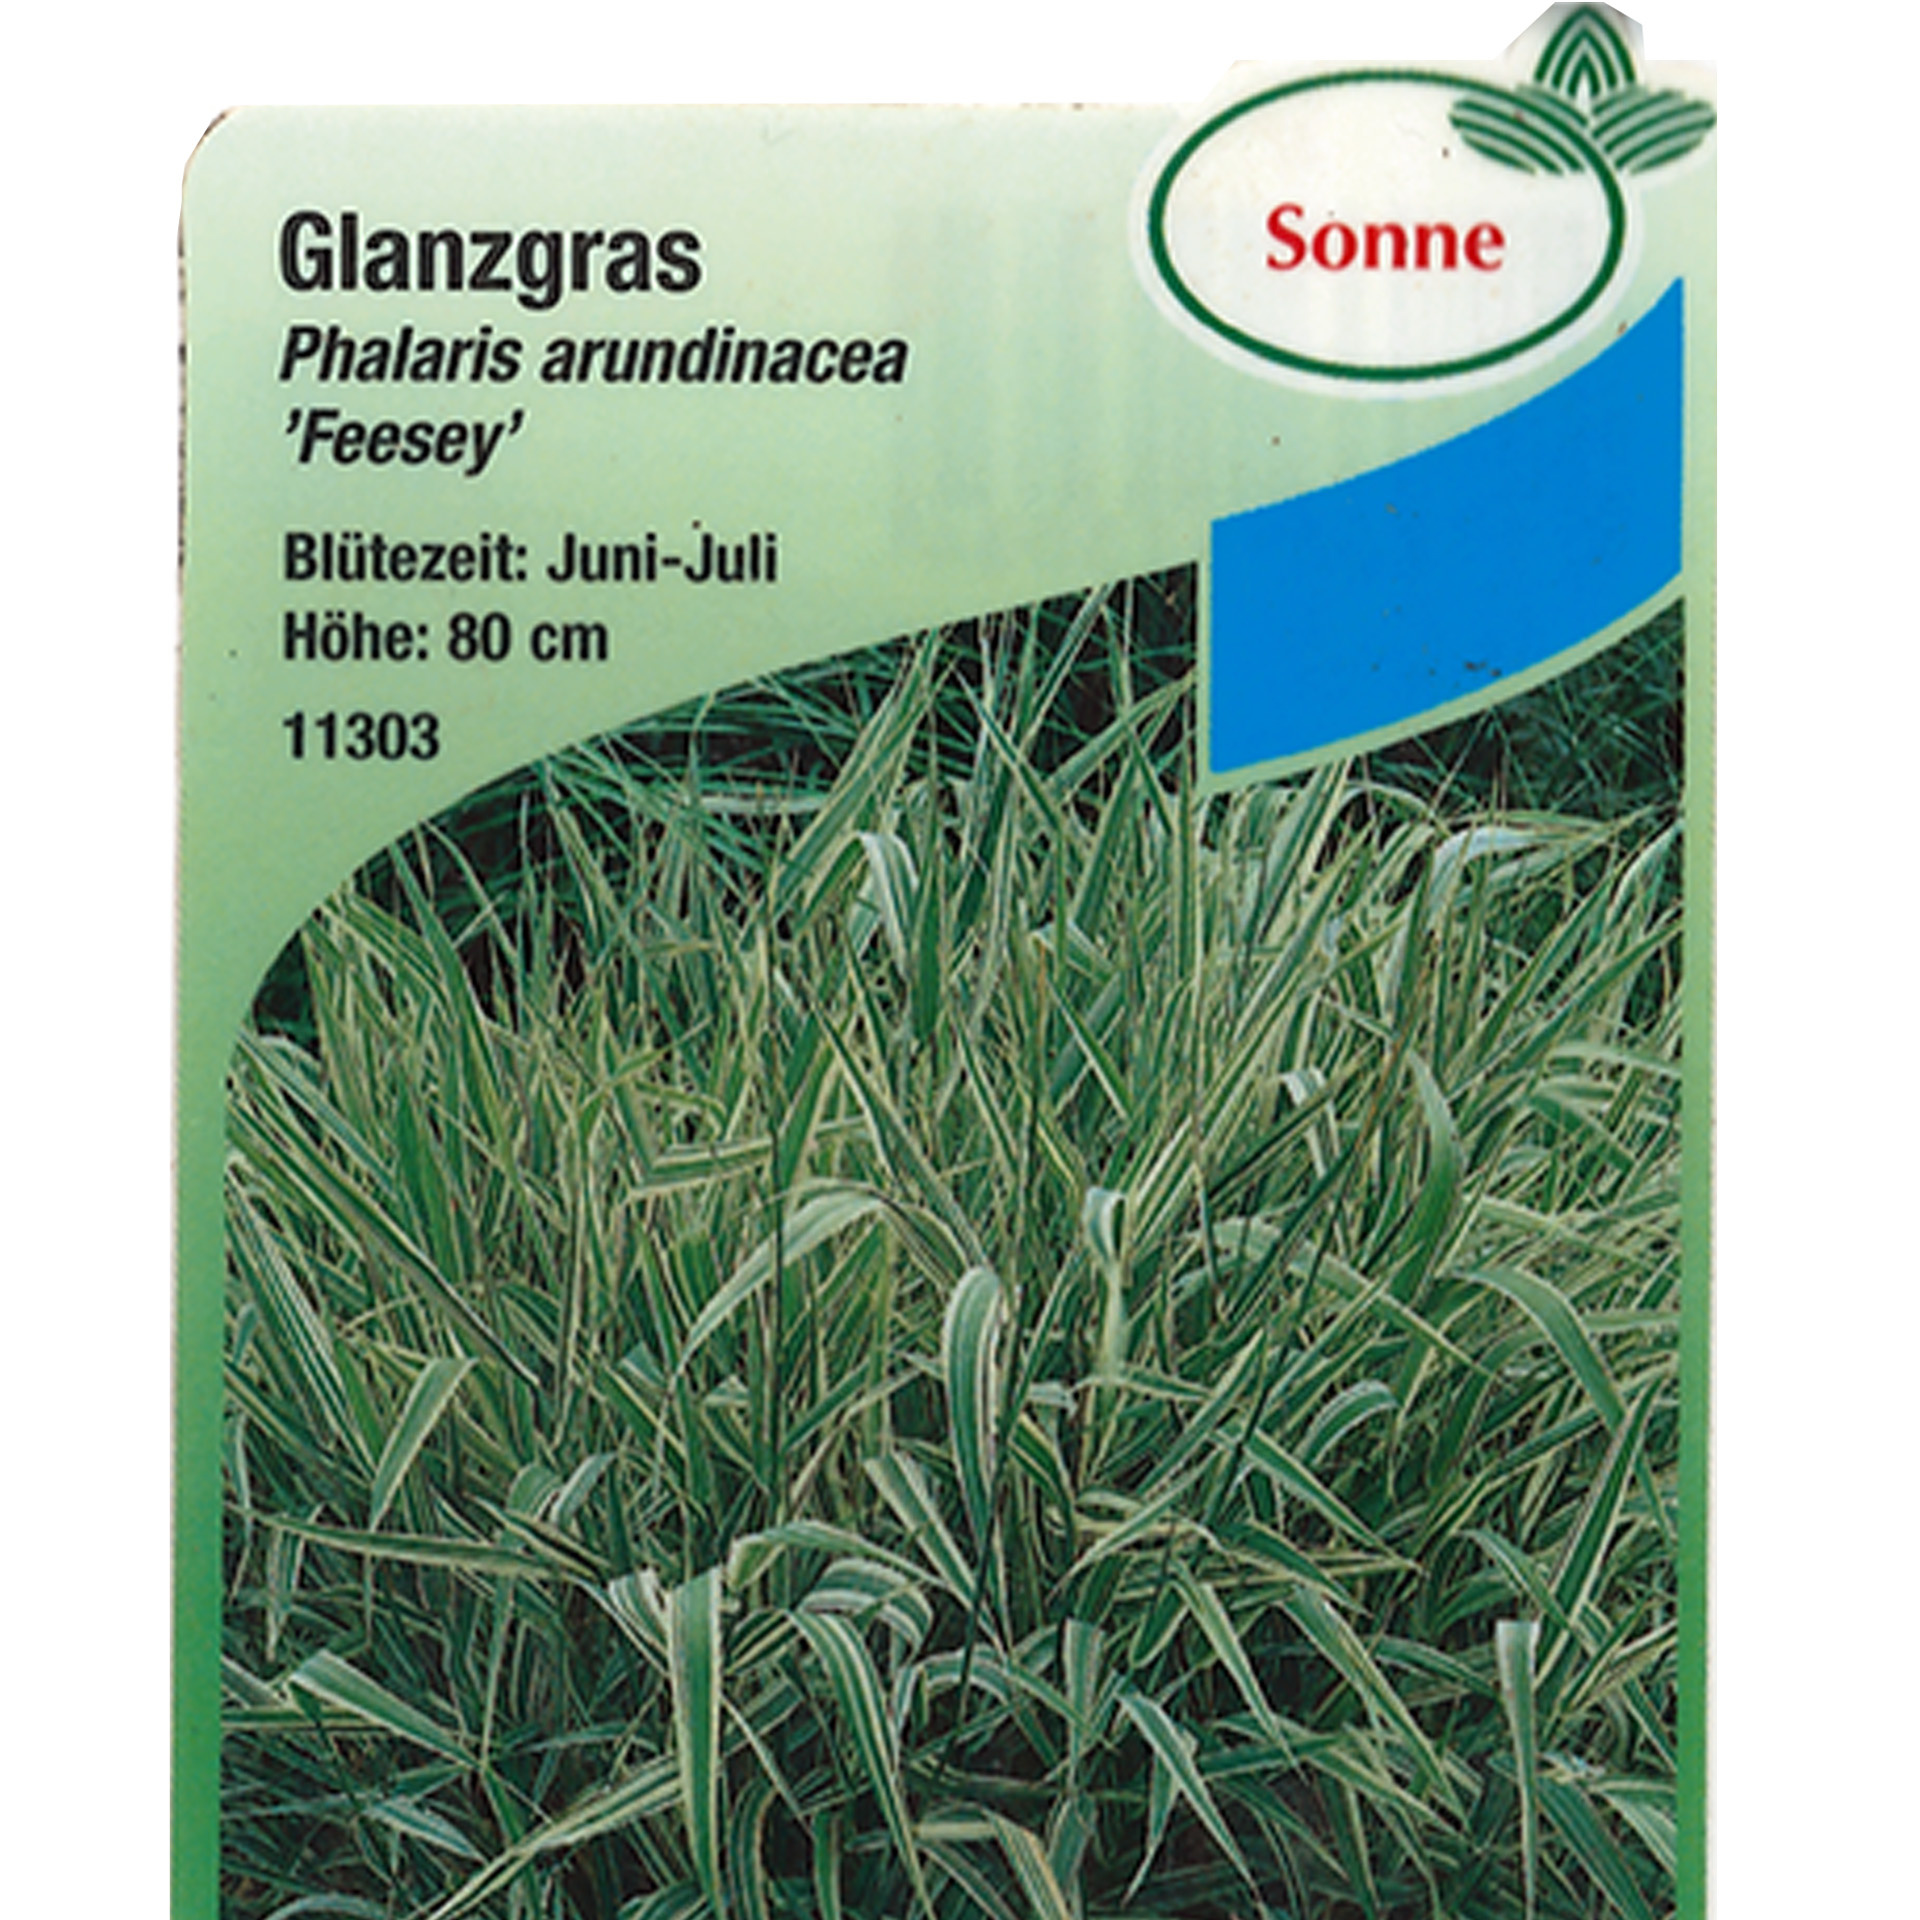 Rohr-Glanzgras - Phalaris arundinacea 'Feesey', 9cm Topf